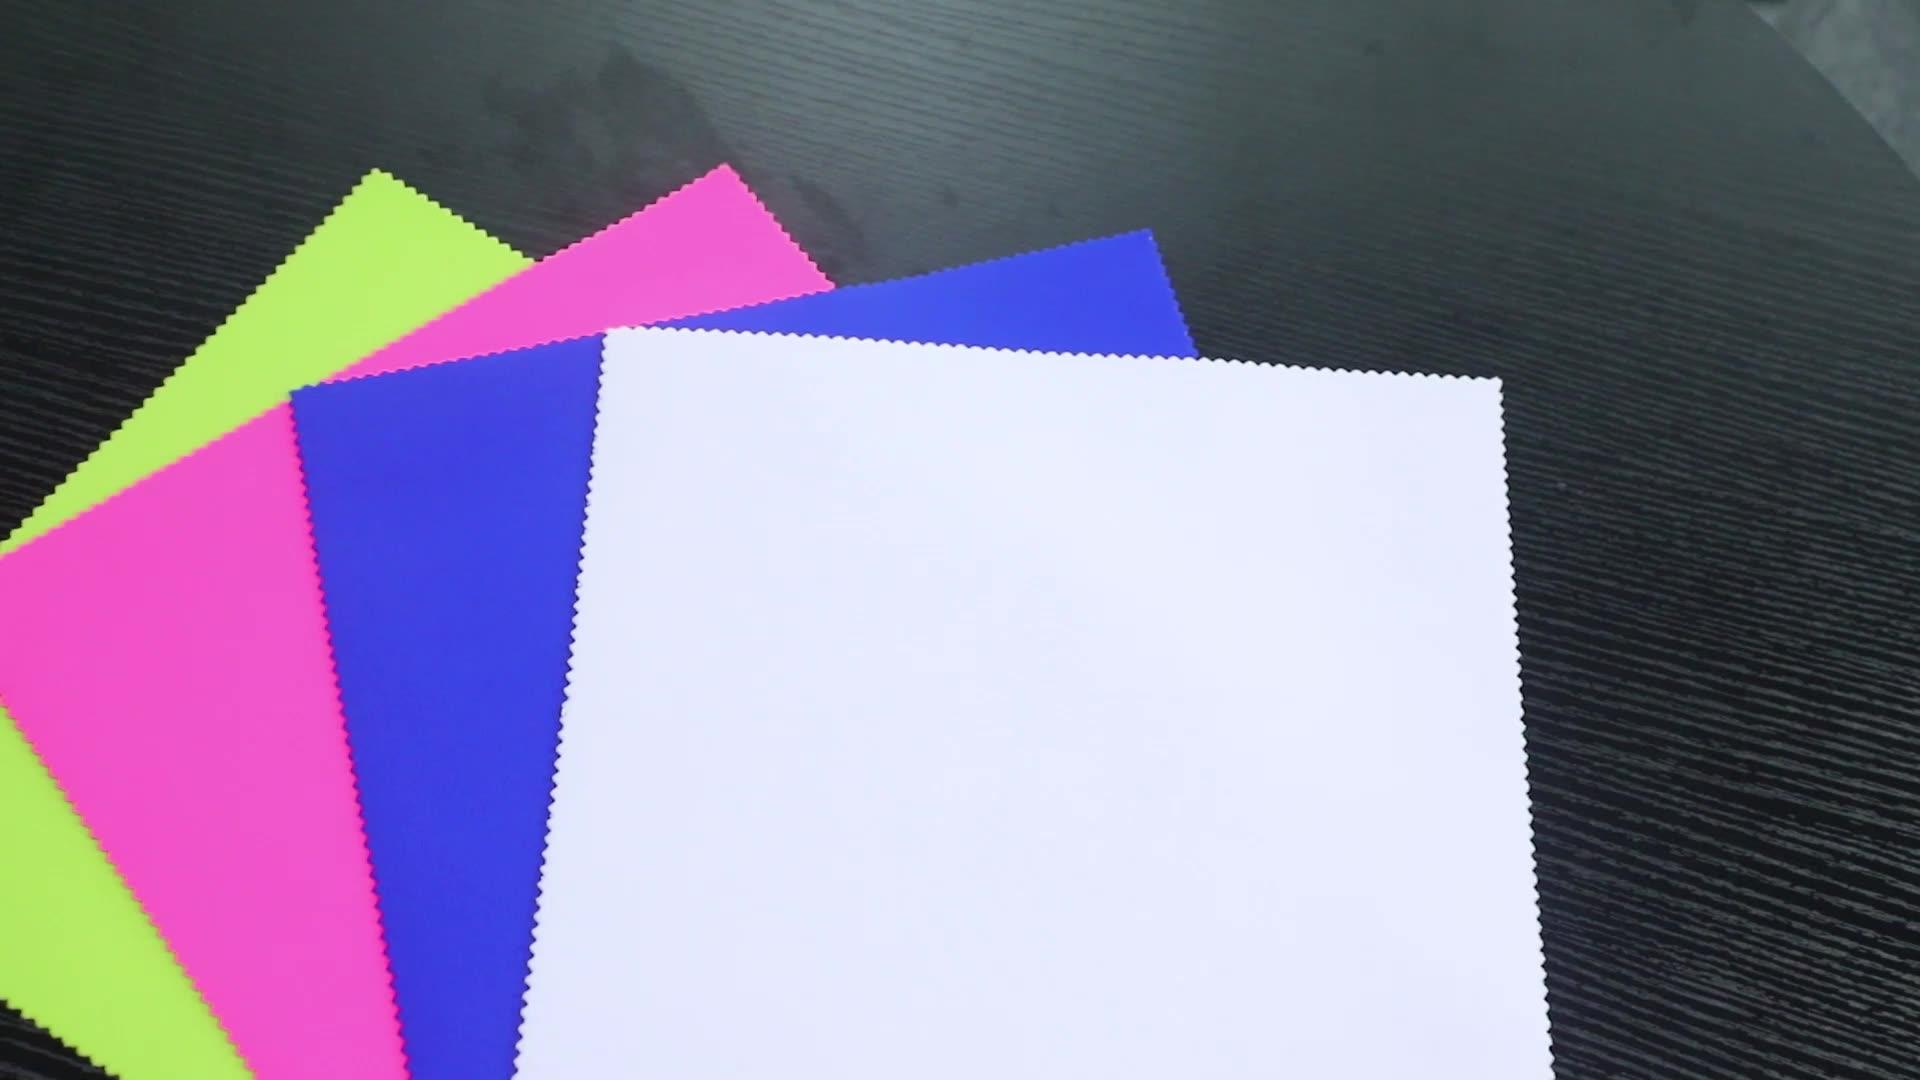 GRS معتمد البيئية المعاد تدويرها RPET الملونة النيوبرين النسيج مصنع قوانغدونغ